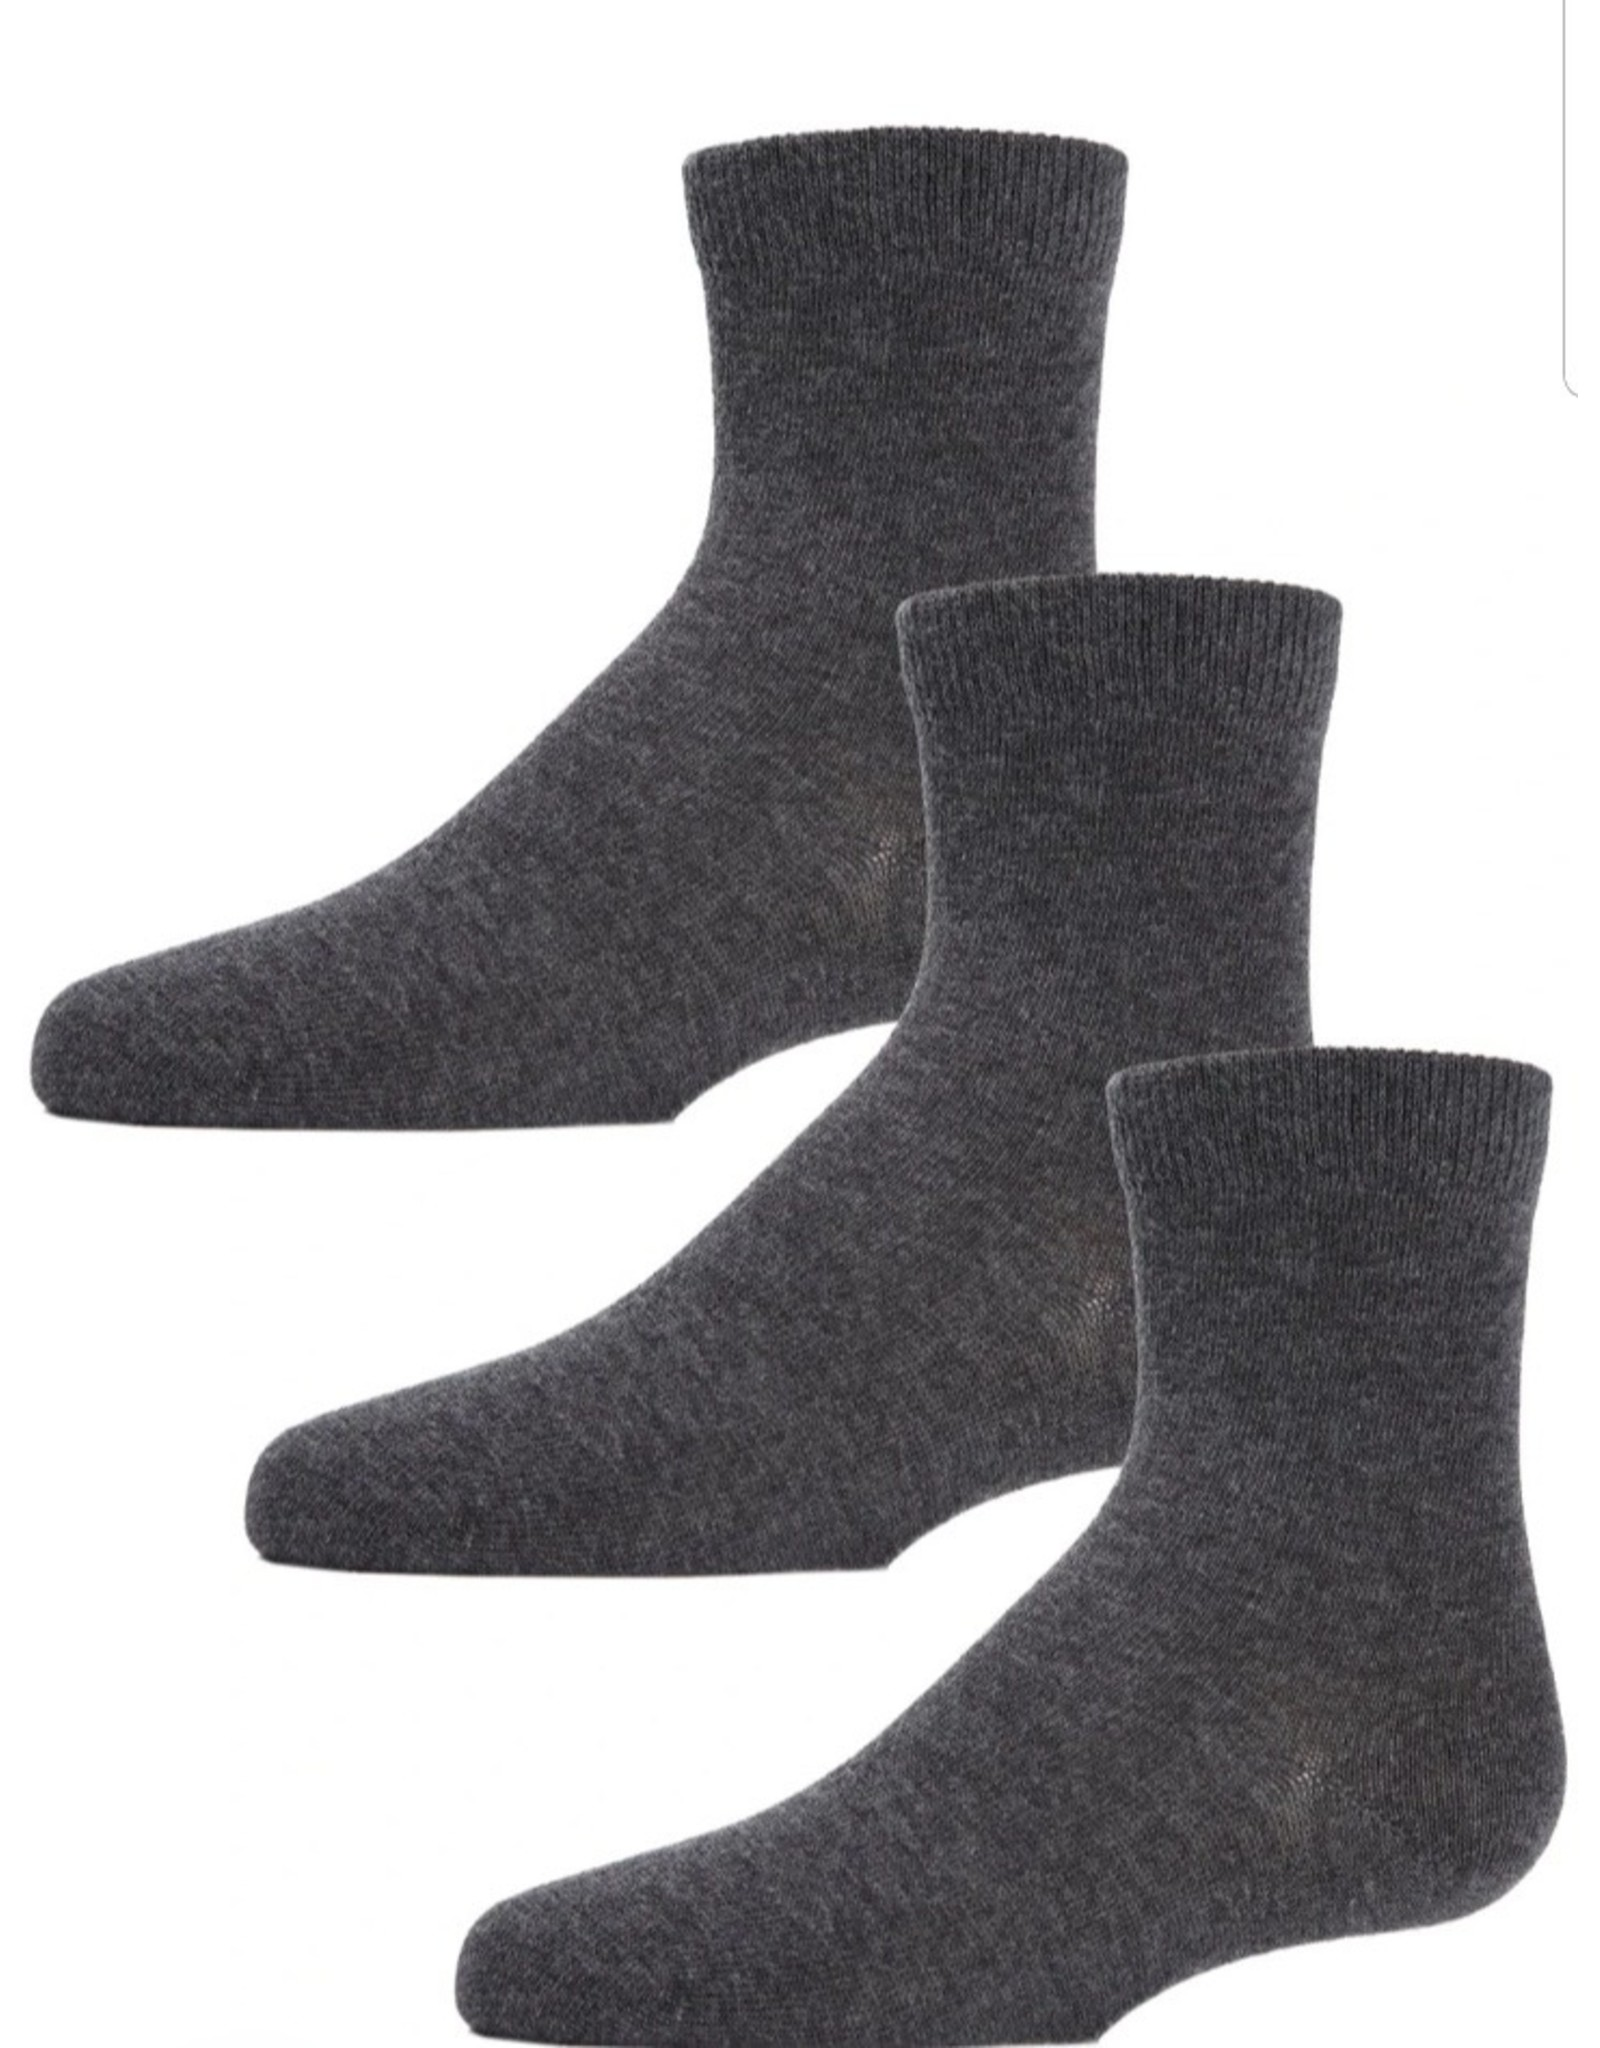 Memoi Memoi Kids Mid Cut Socks 3 Pair Pack MK-556